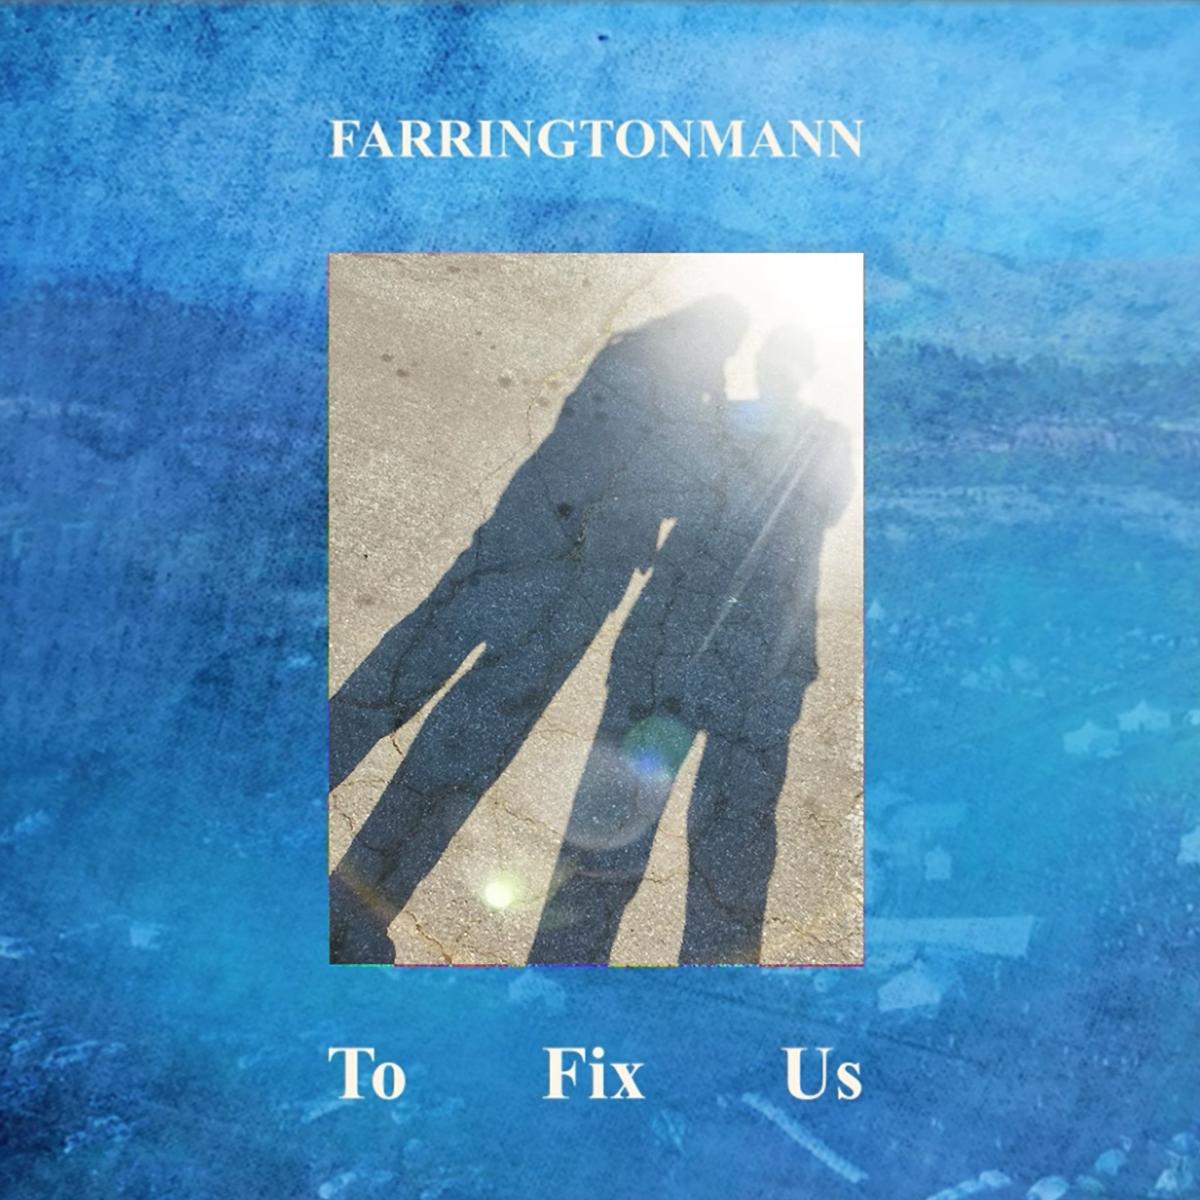 Farringtonmann - To Fix Us - Single